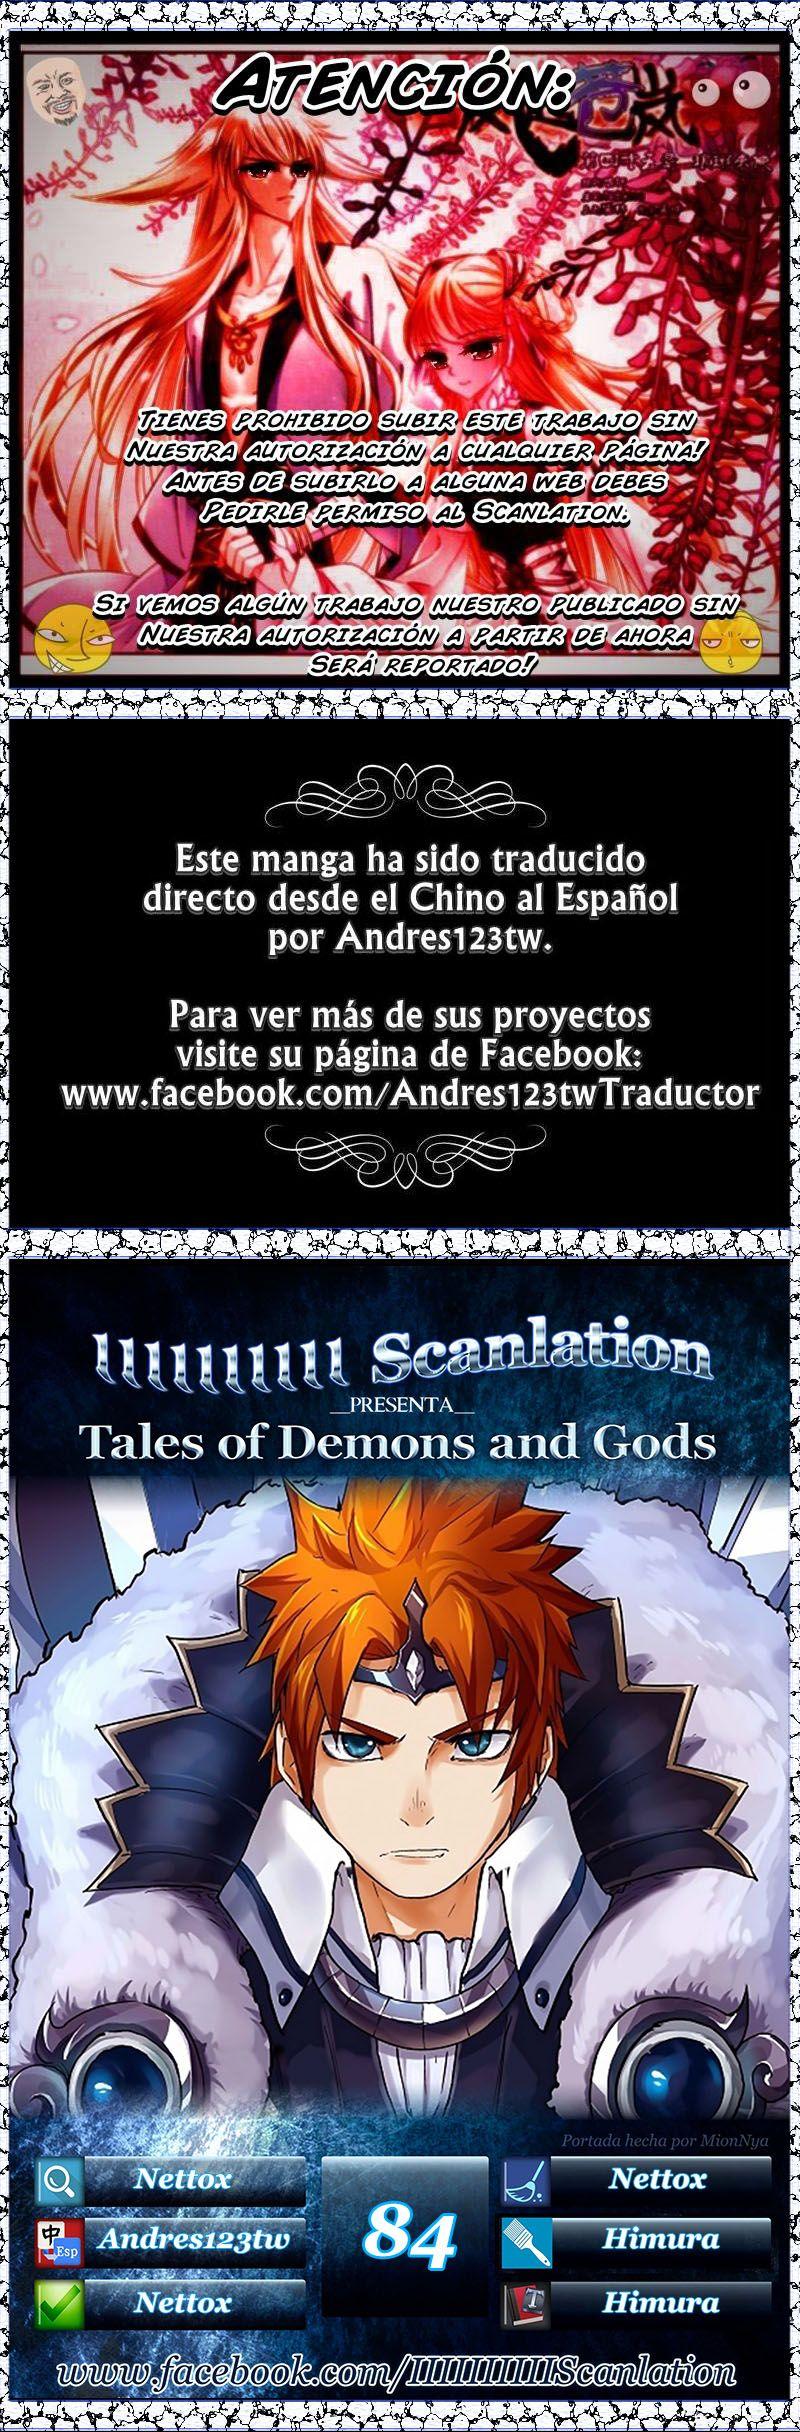 http://c5.ninemanga.com/es_manga/7/17735/472755/7f01c939761597f9b832694d4c381512.jpg Page 1